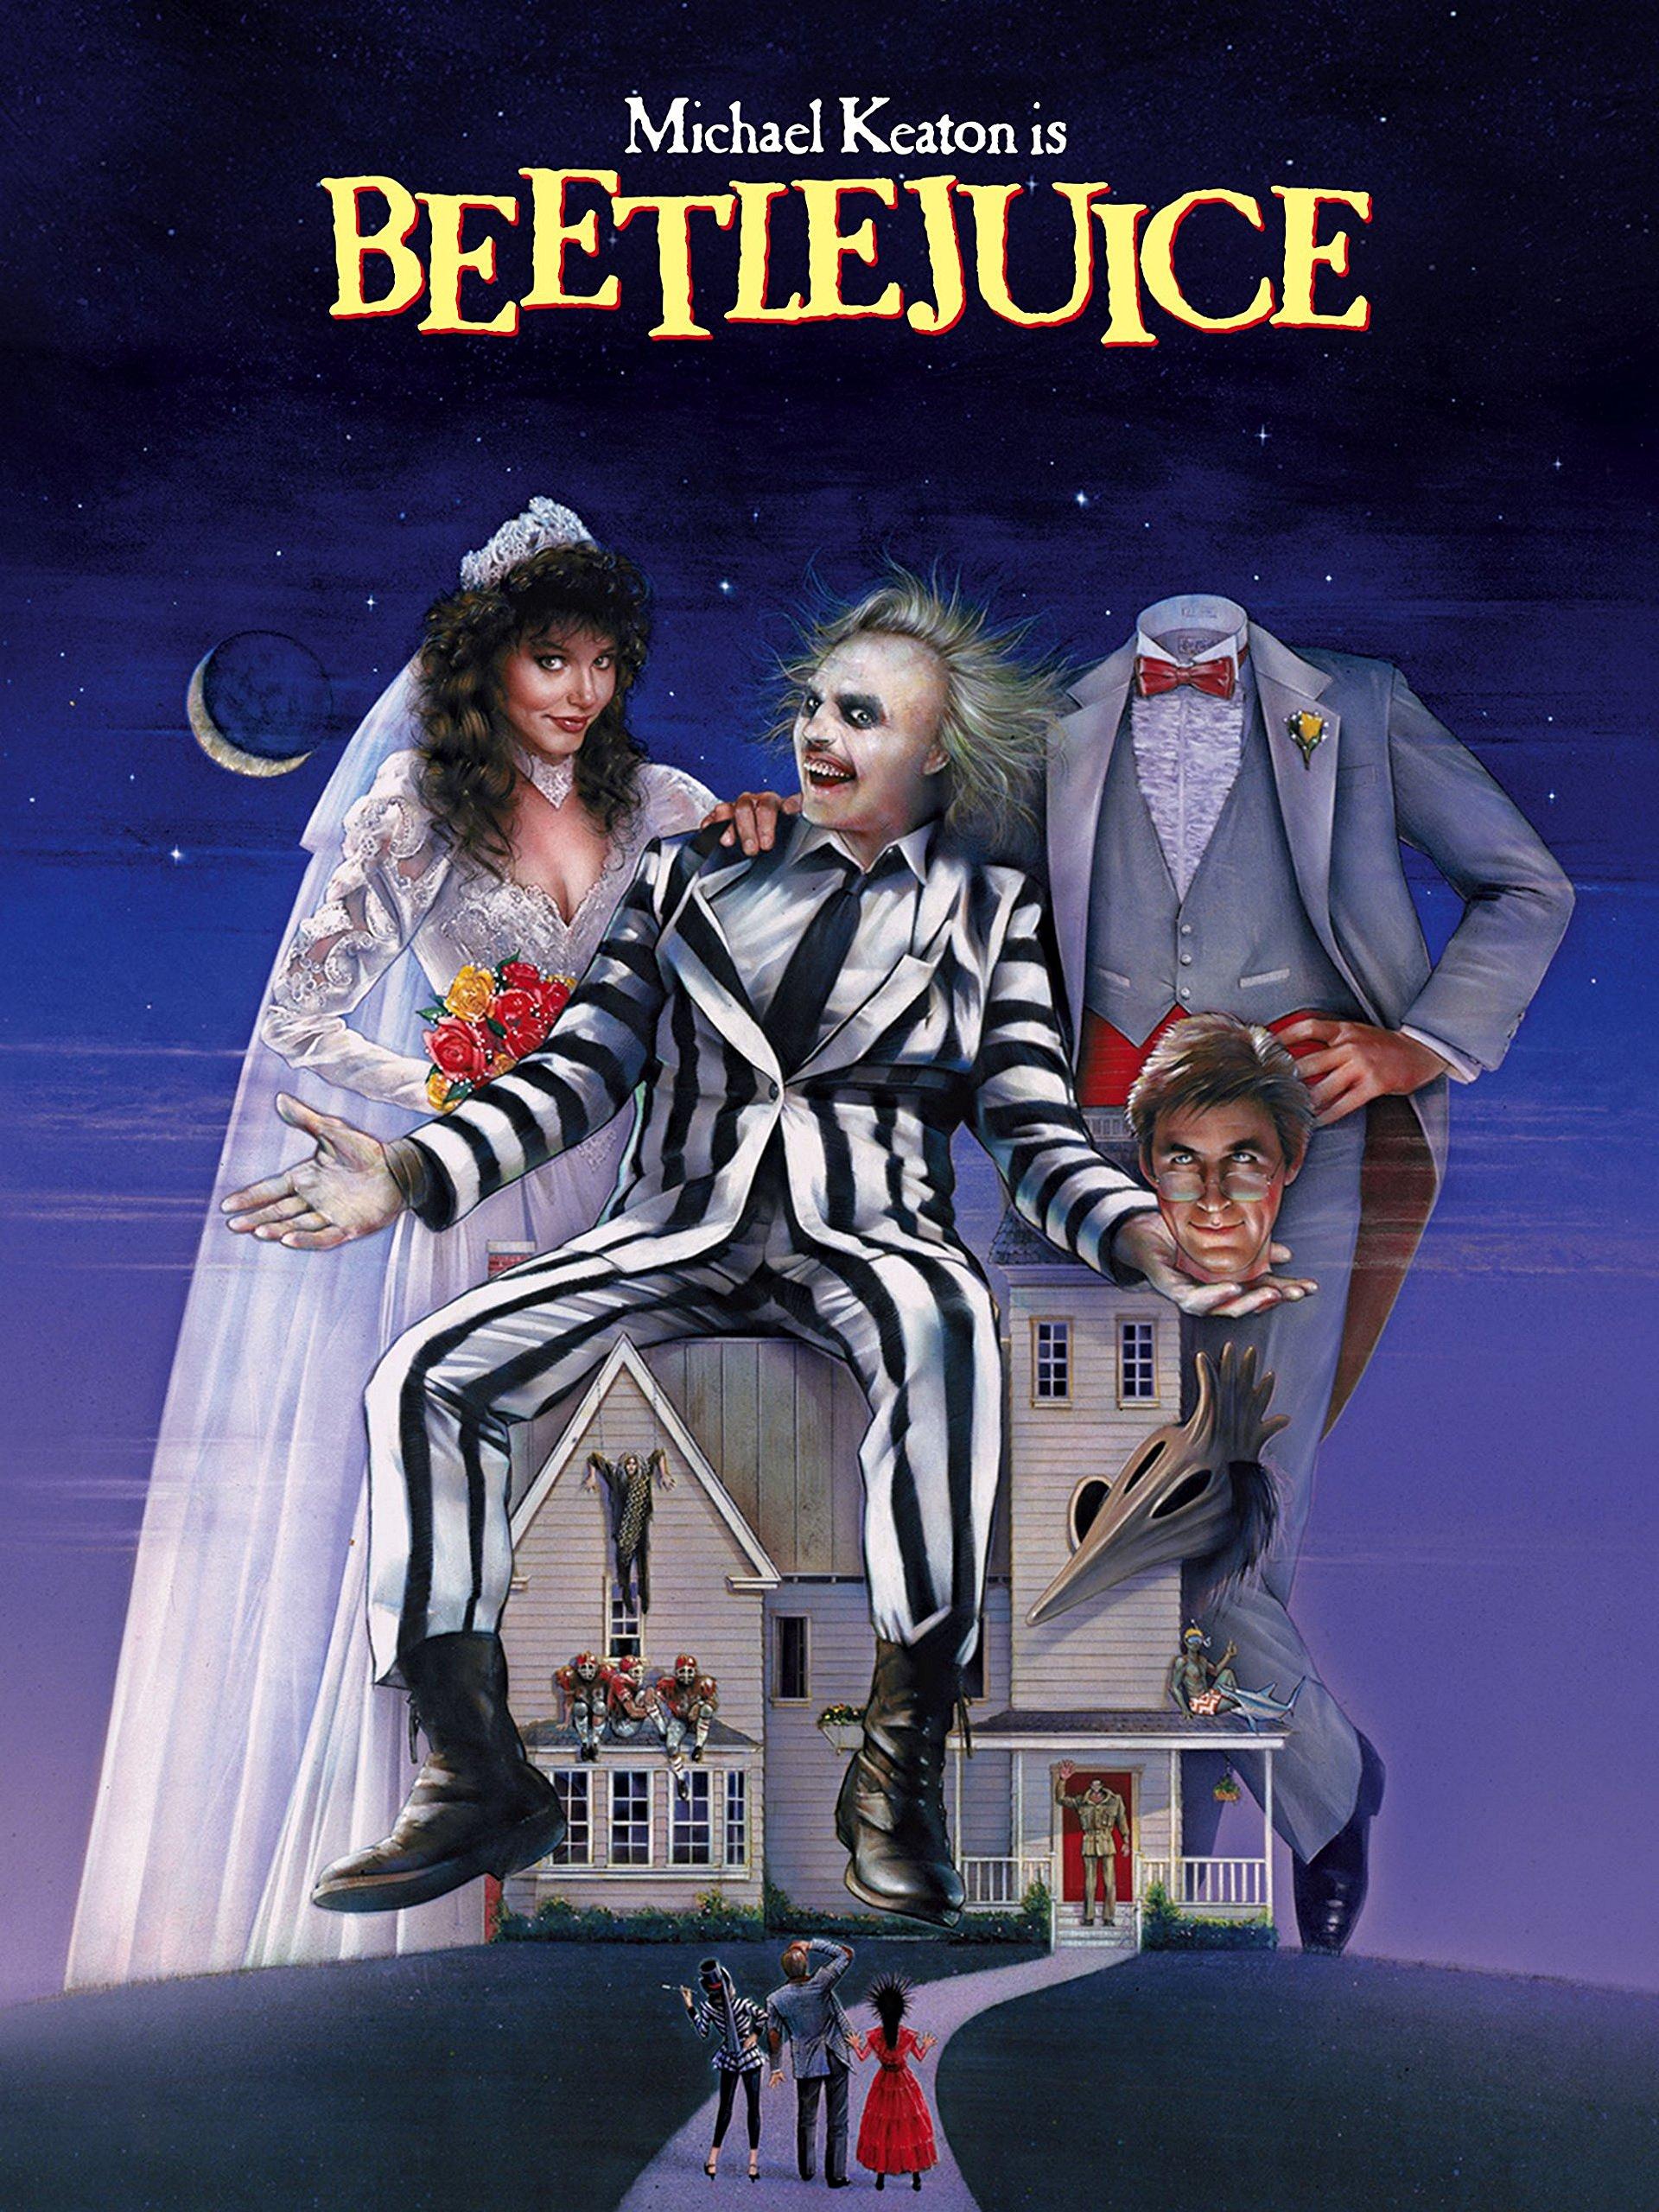 Blog Tour - L'ottava confraternita. Case, Hotel... e Fantasmi nei libri e nei film - Beetlejuice